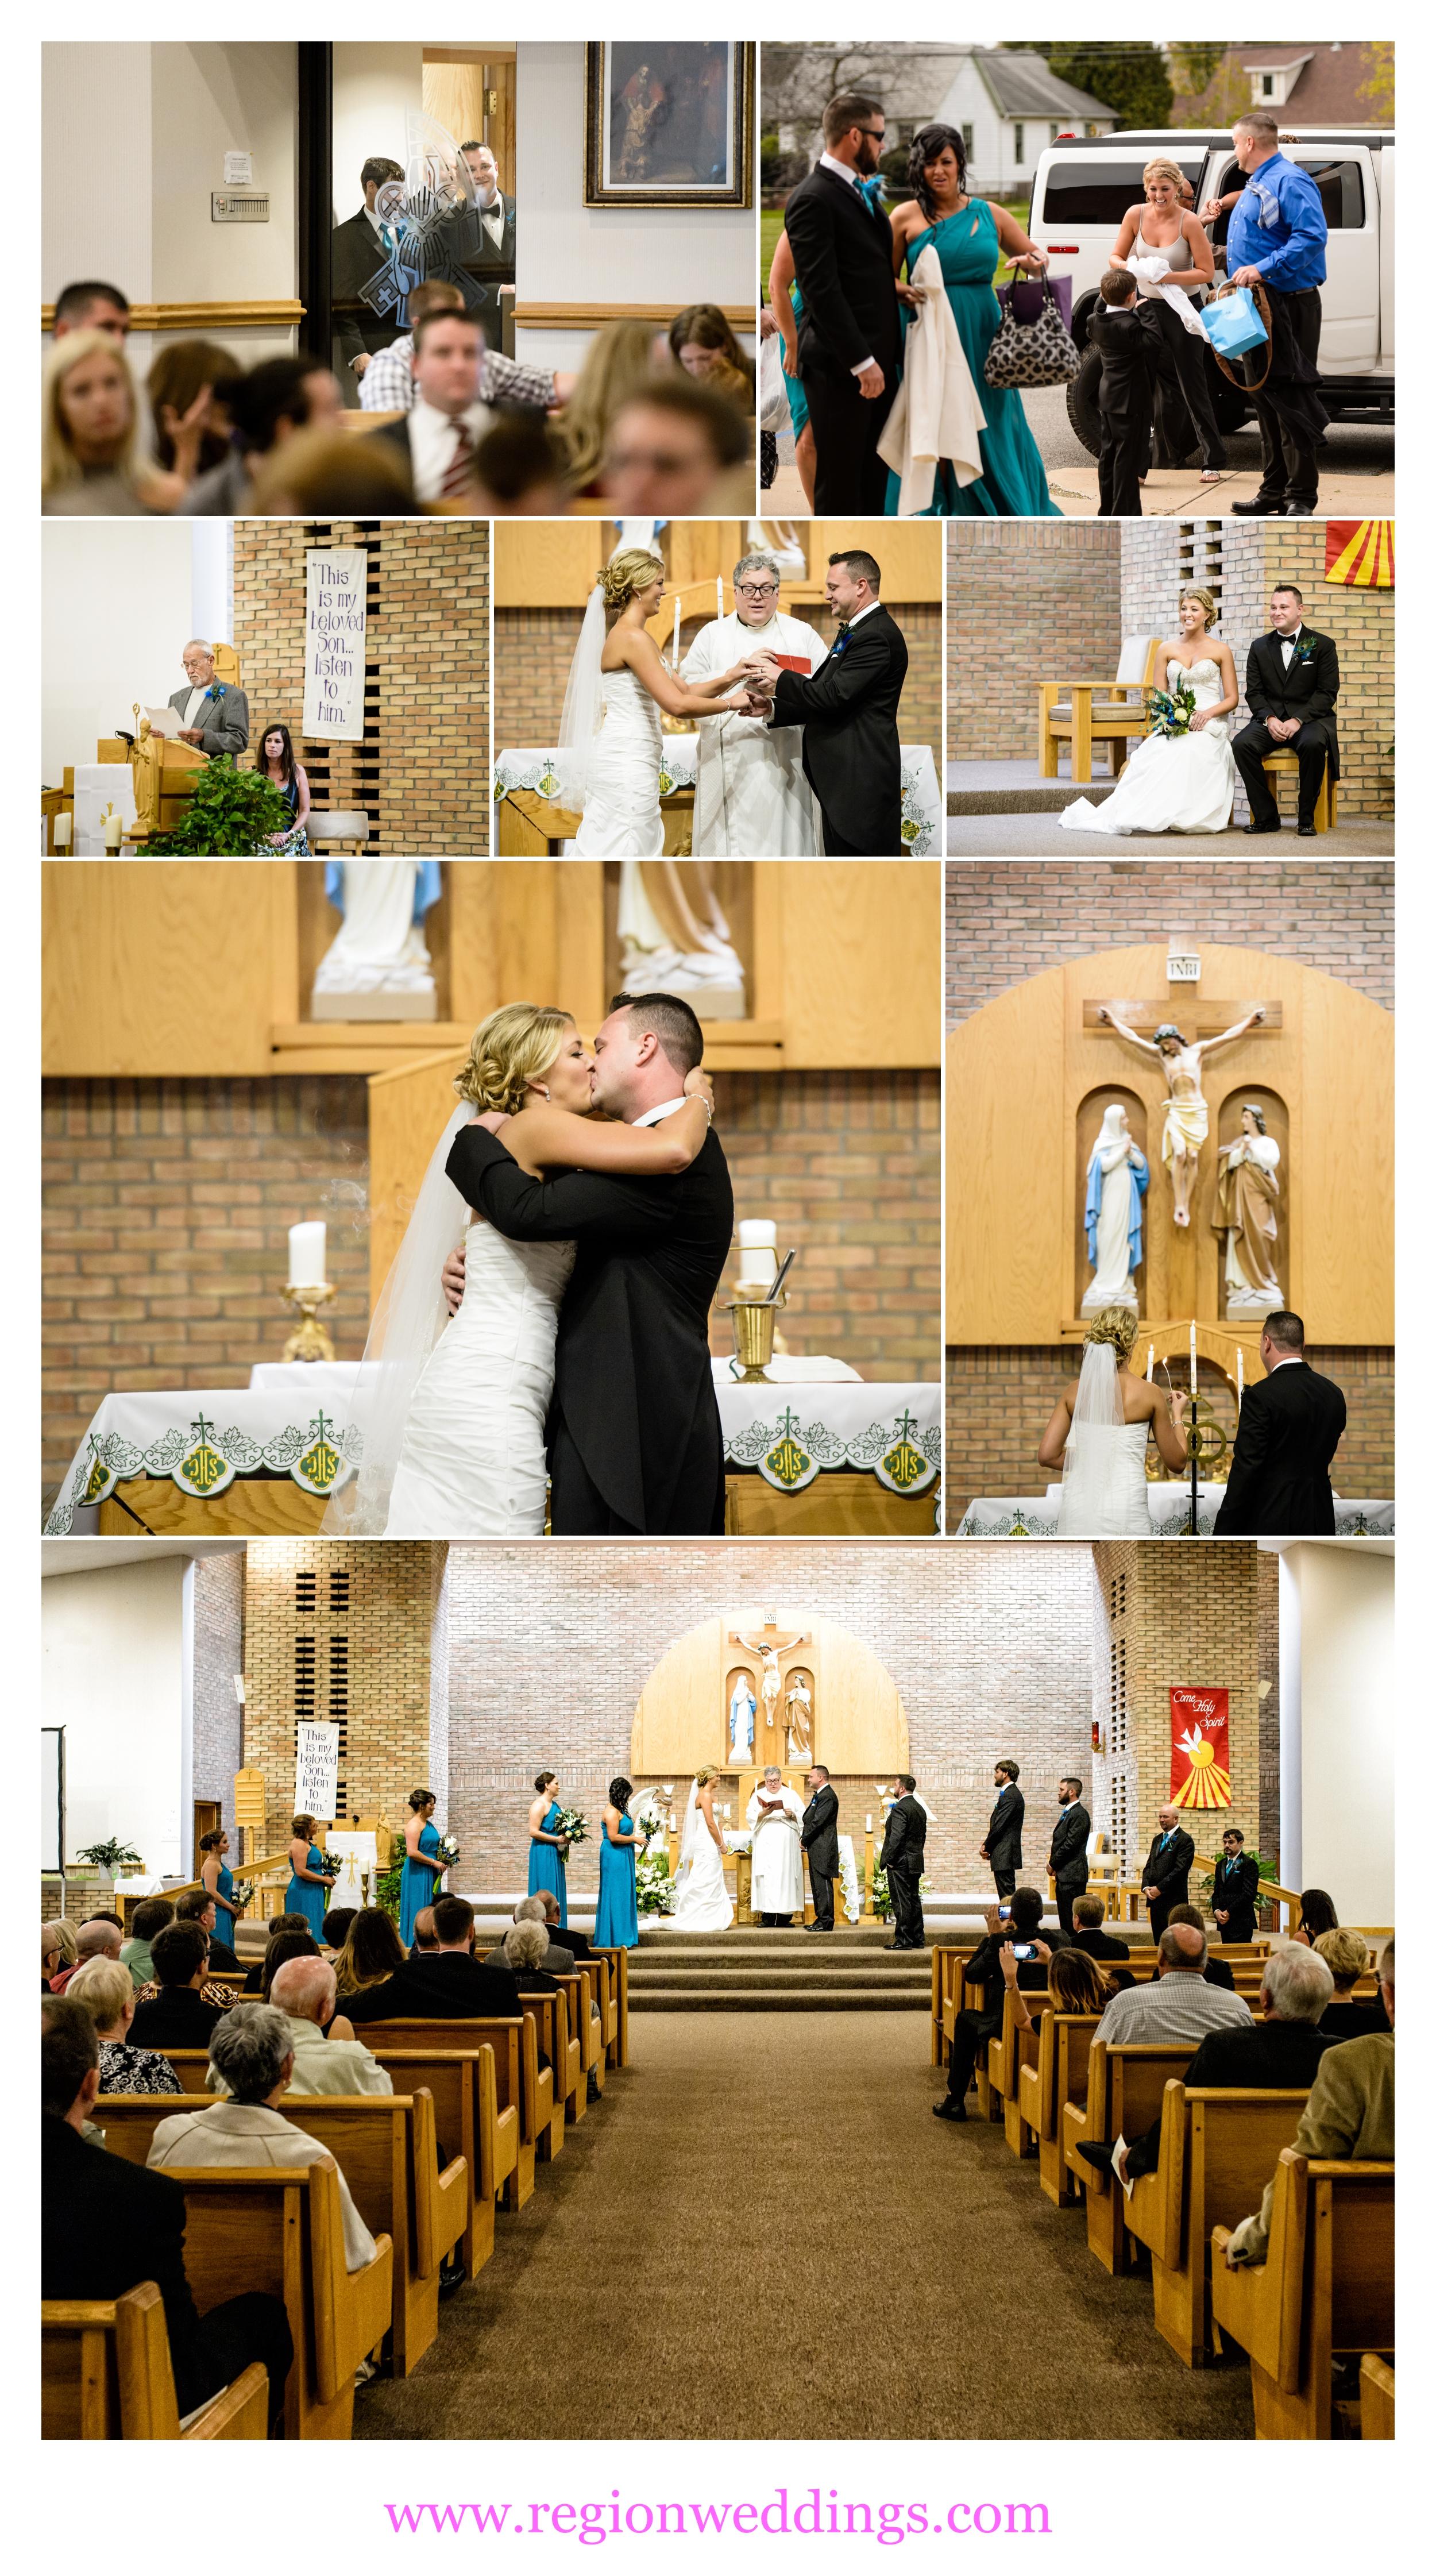 Wedding ceremony at St. Patrick Catholic Church in Chesterton, Indiana.